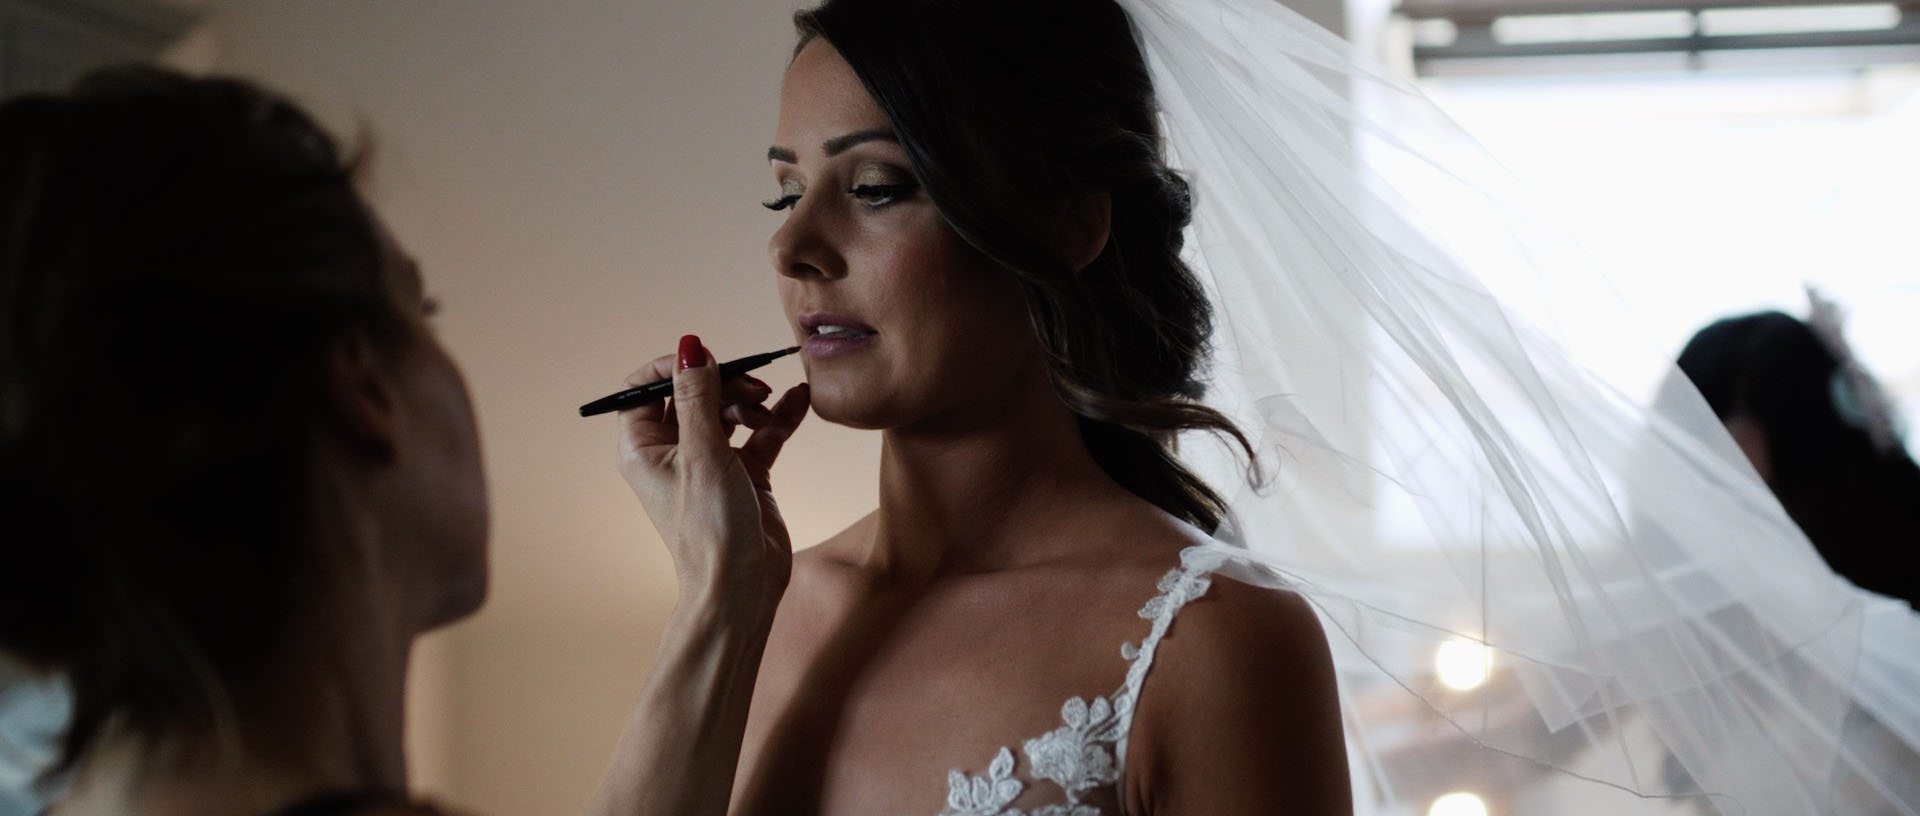 Hyde Barn Colswolds Wedding Verity-Jade & Kai 16 Cropped.jpg